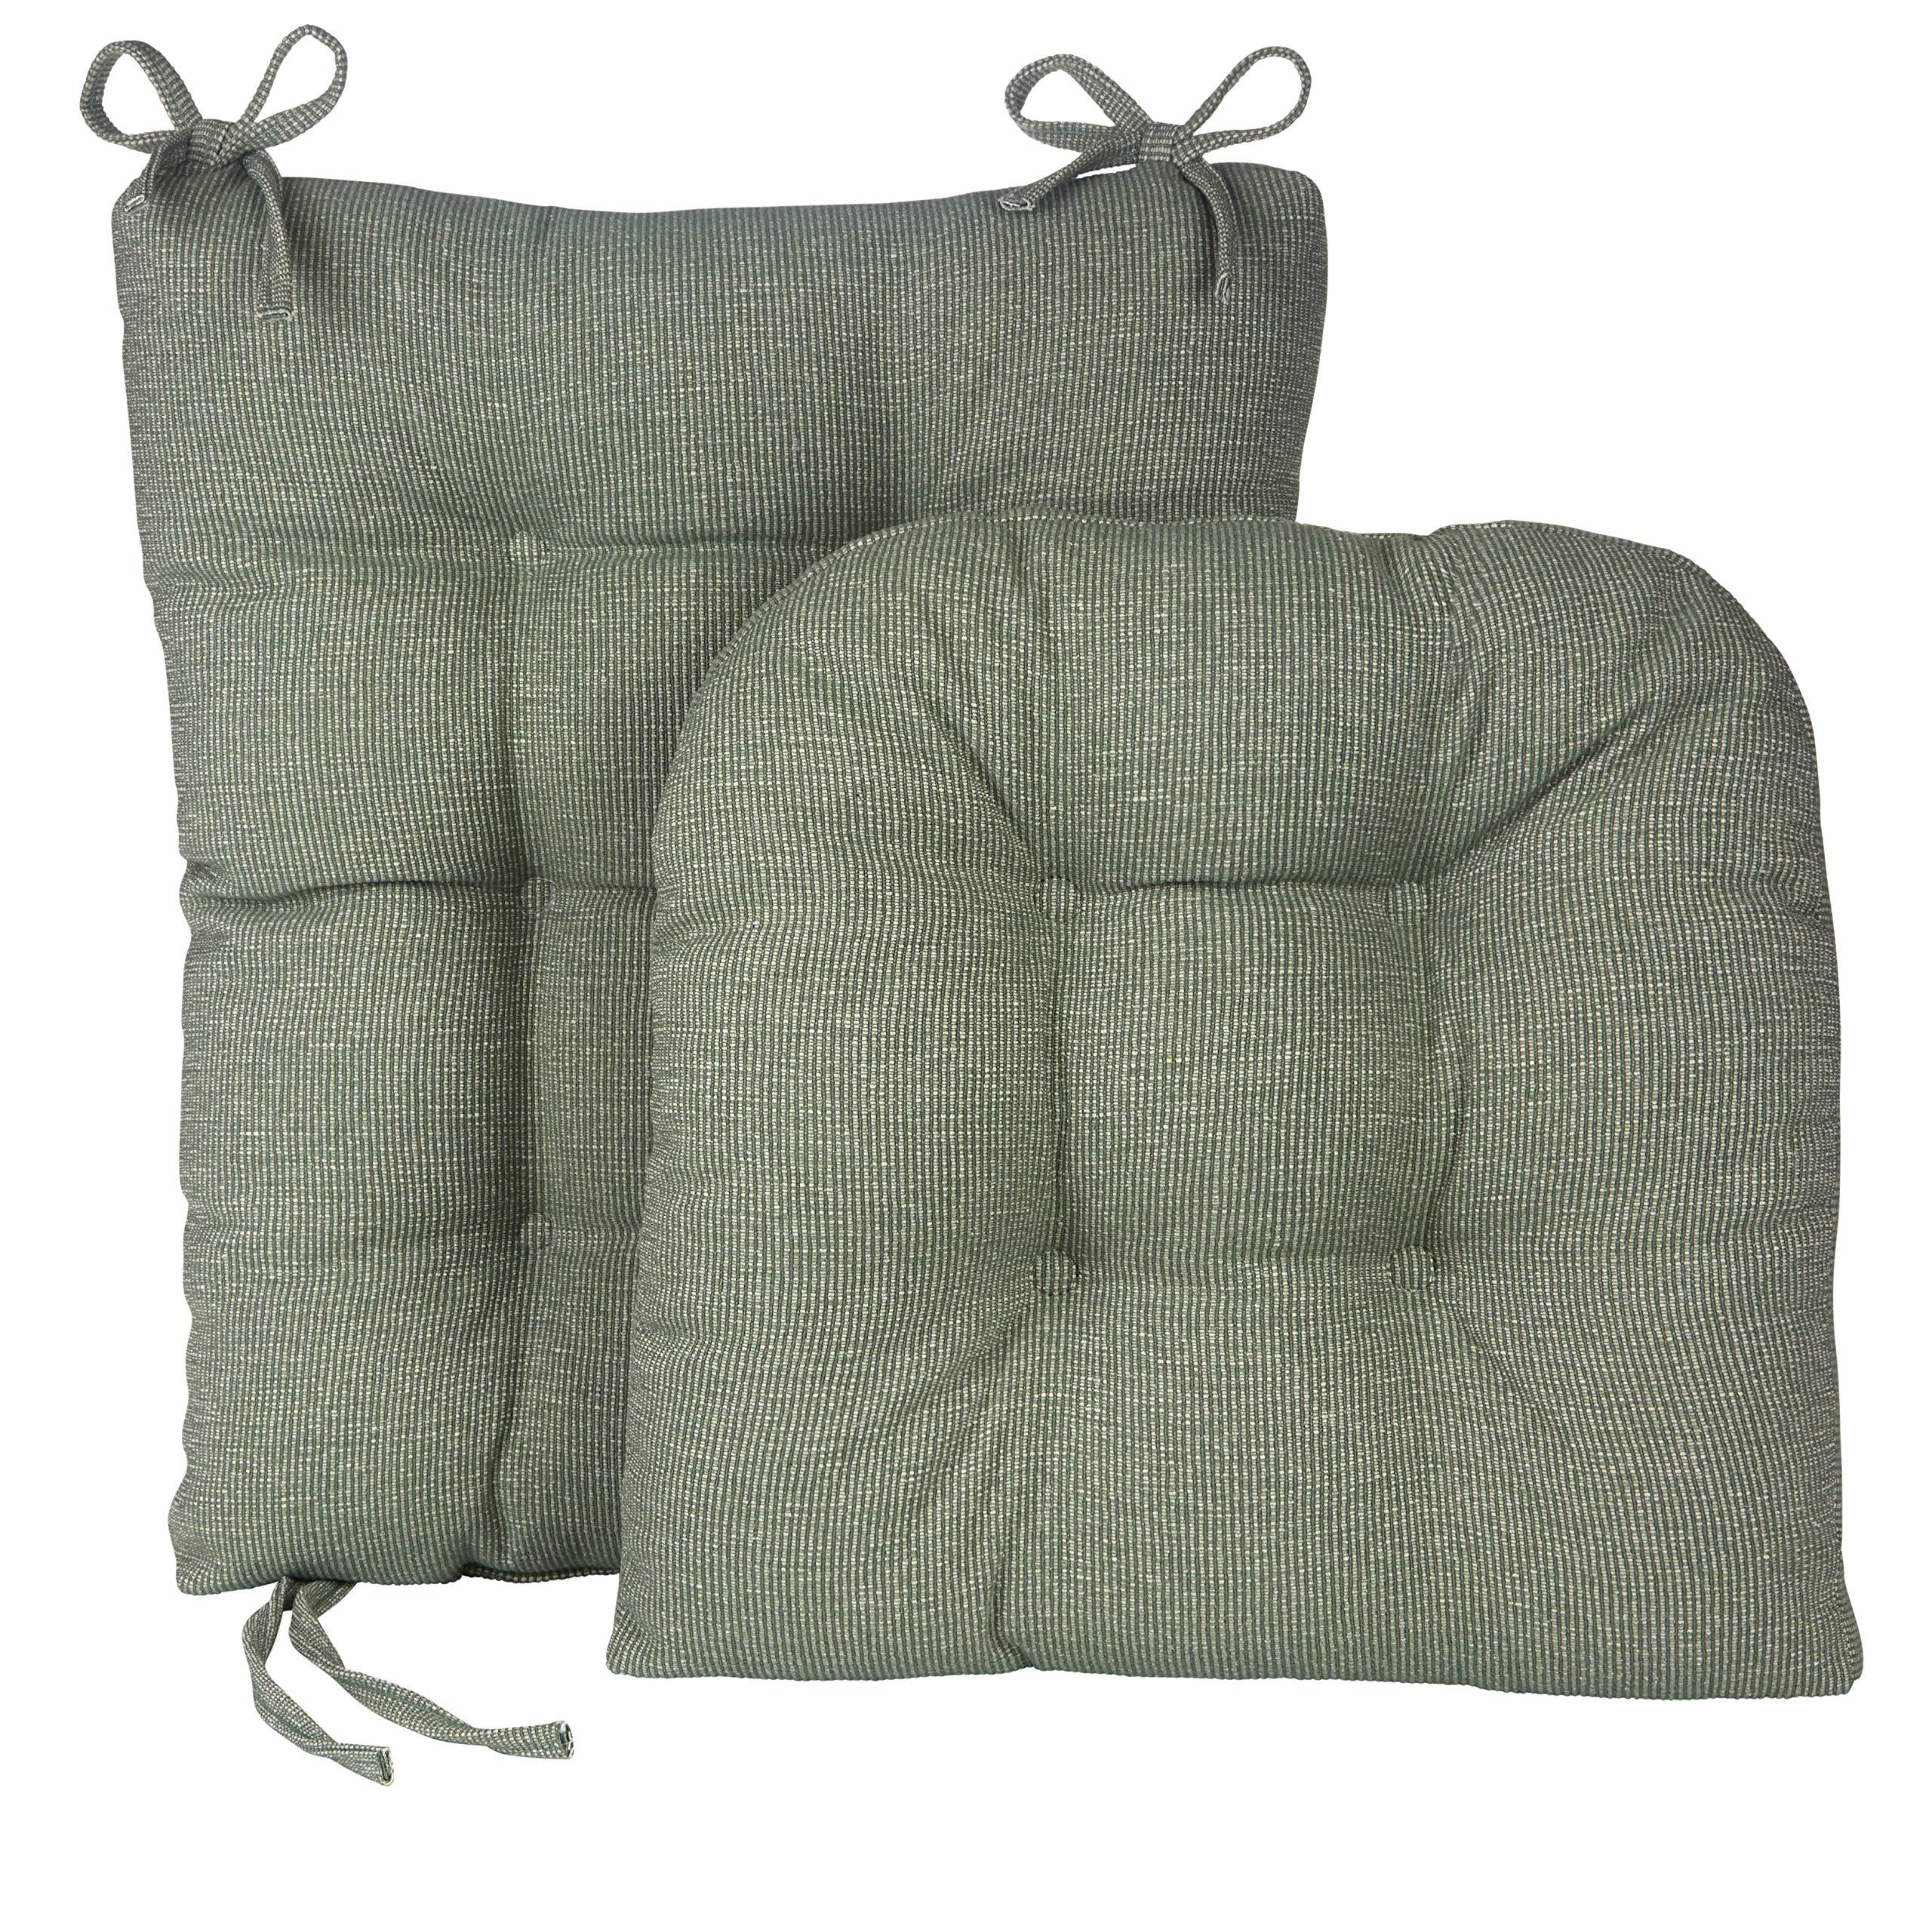 Klear Vu Gripper Jumbo Saturn Rocking Chair Cushion Set, Celadon